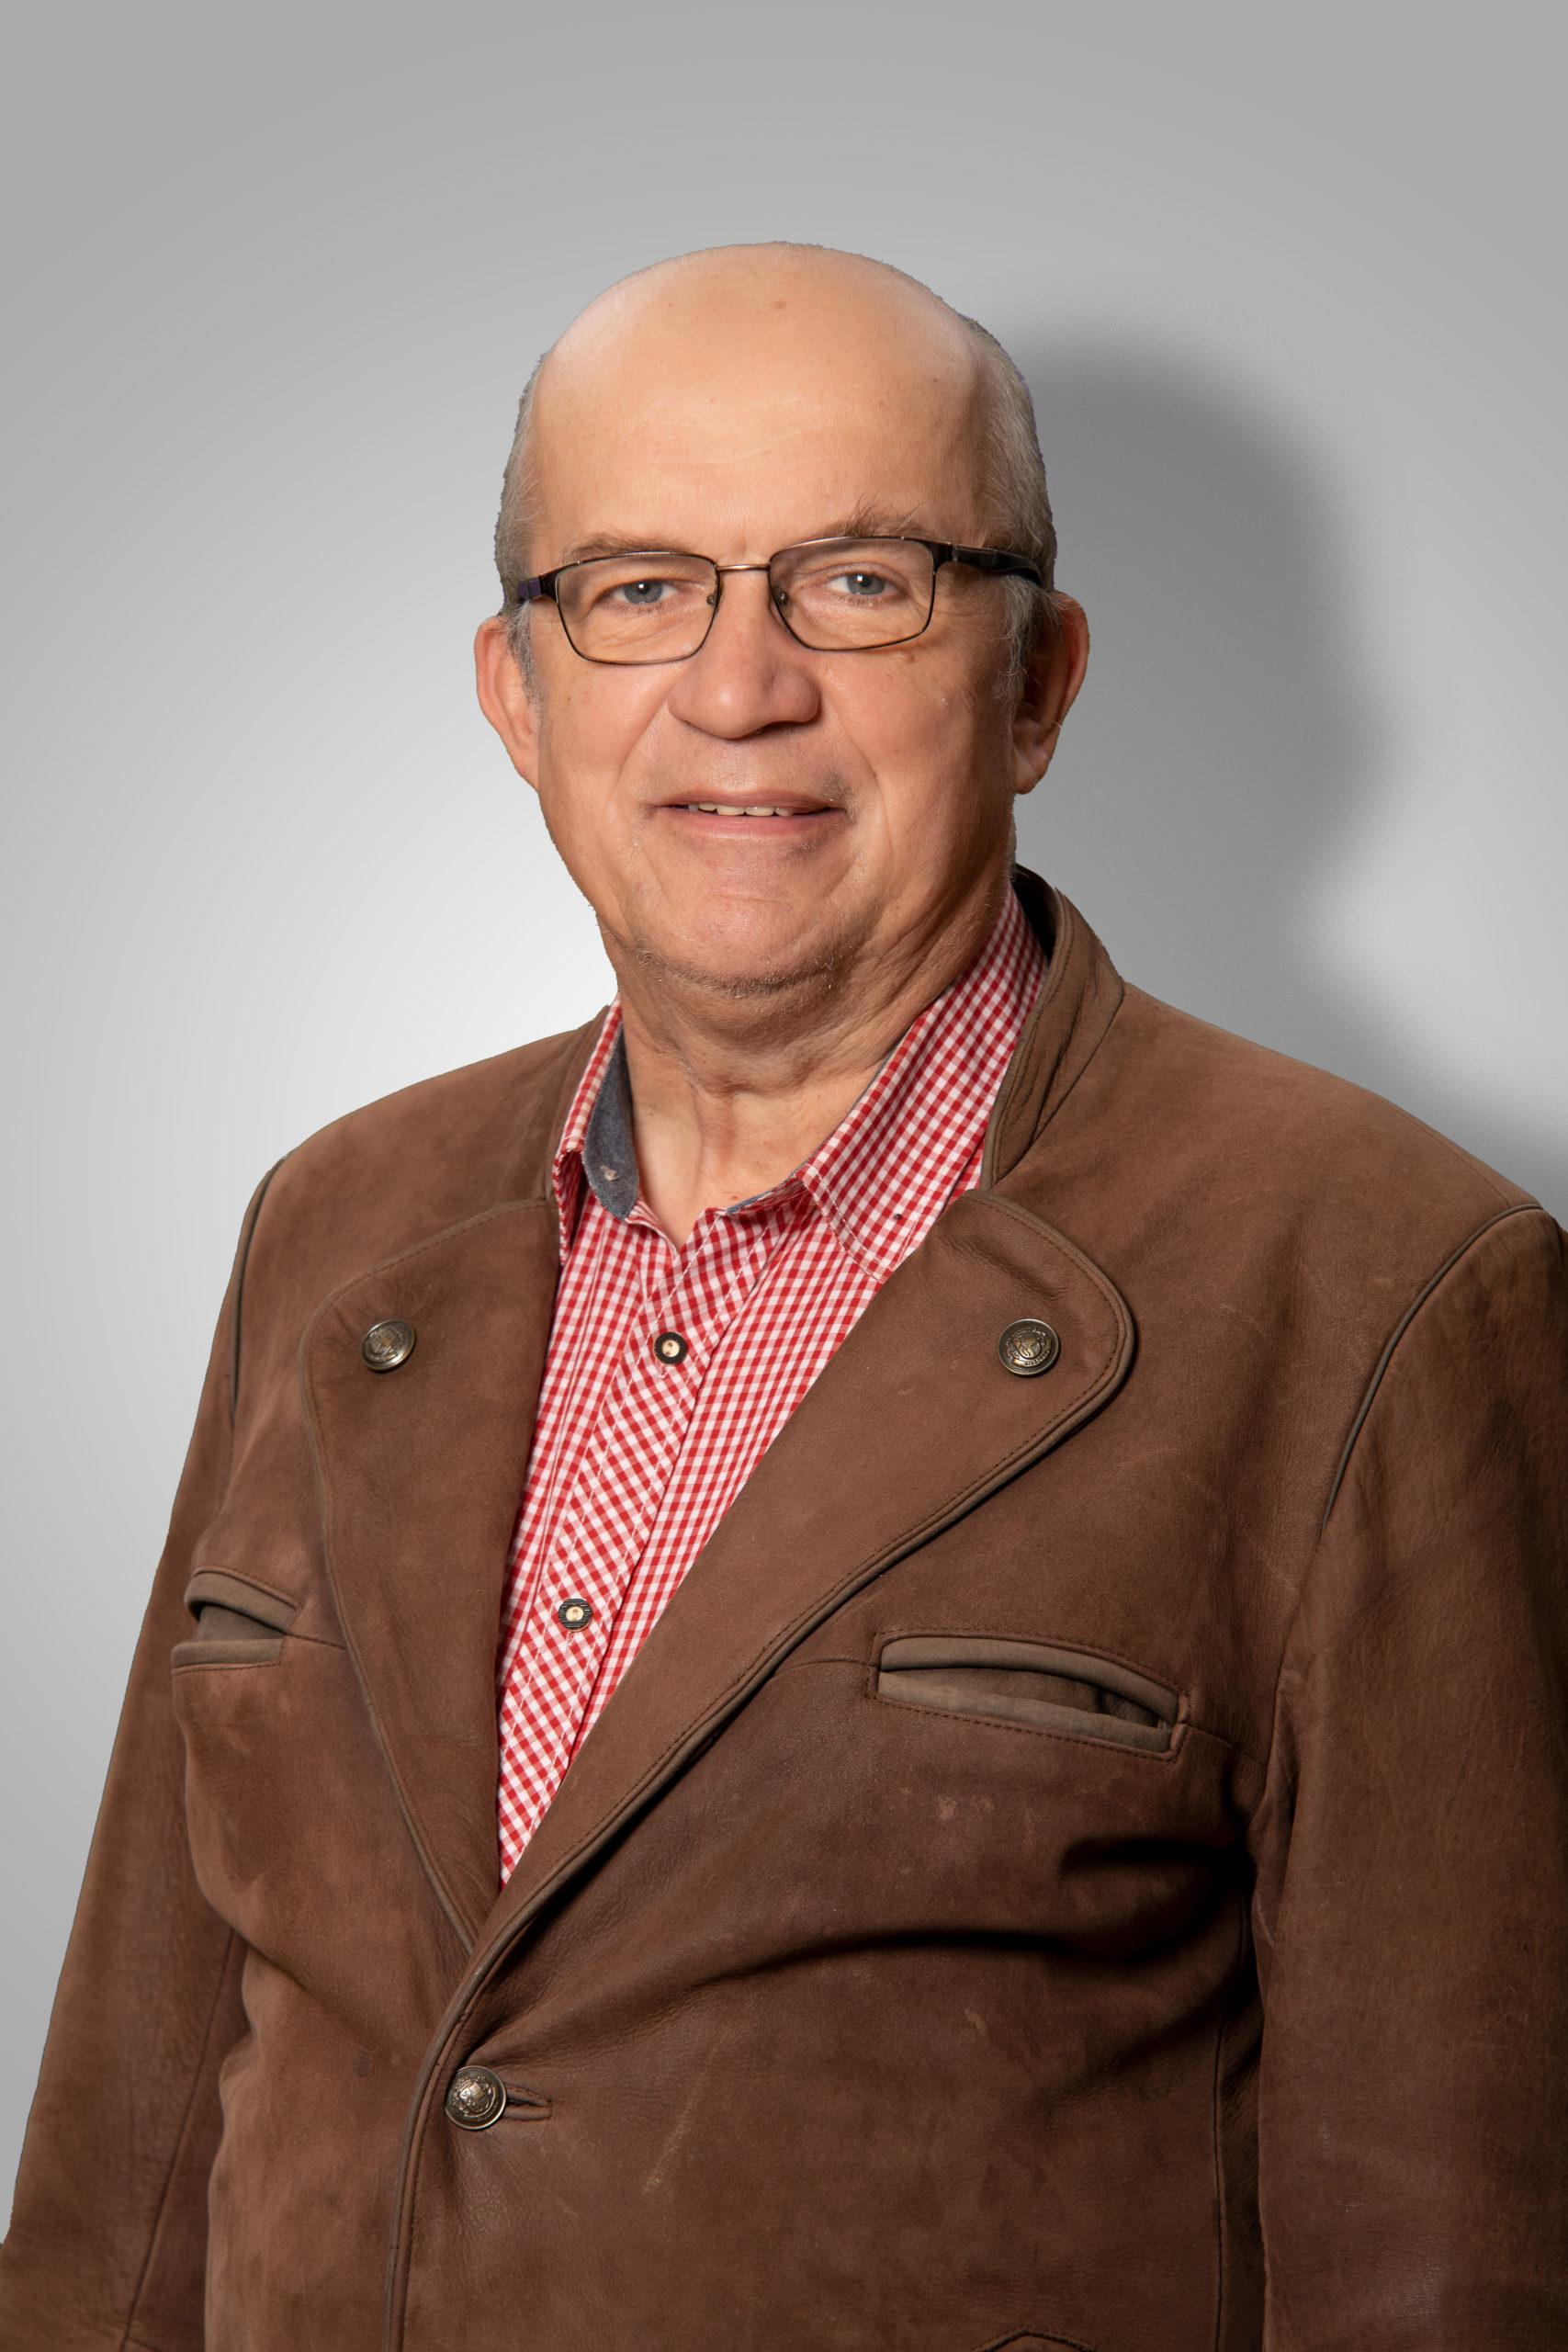 Peter Rydlo